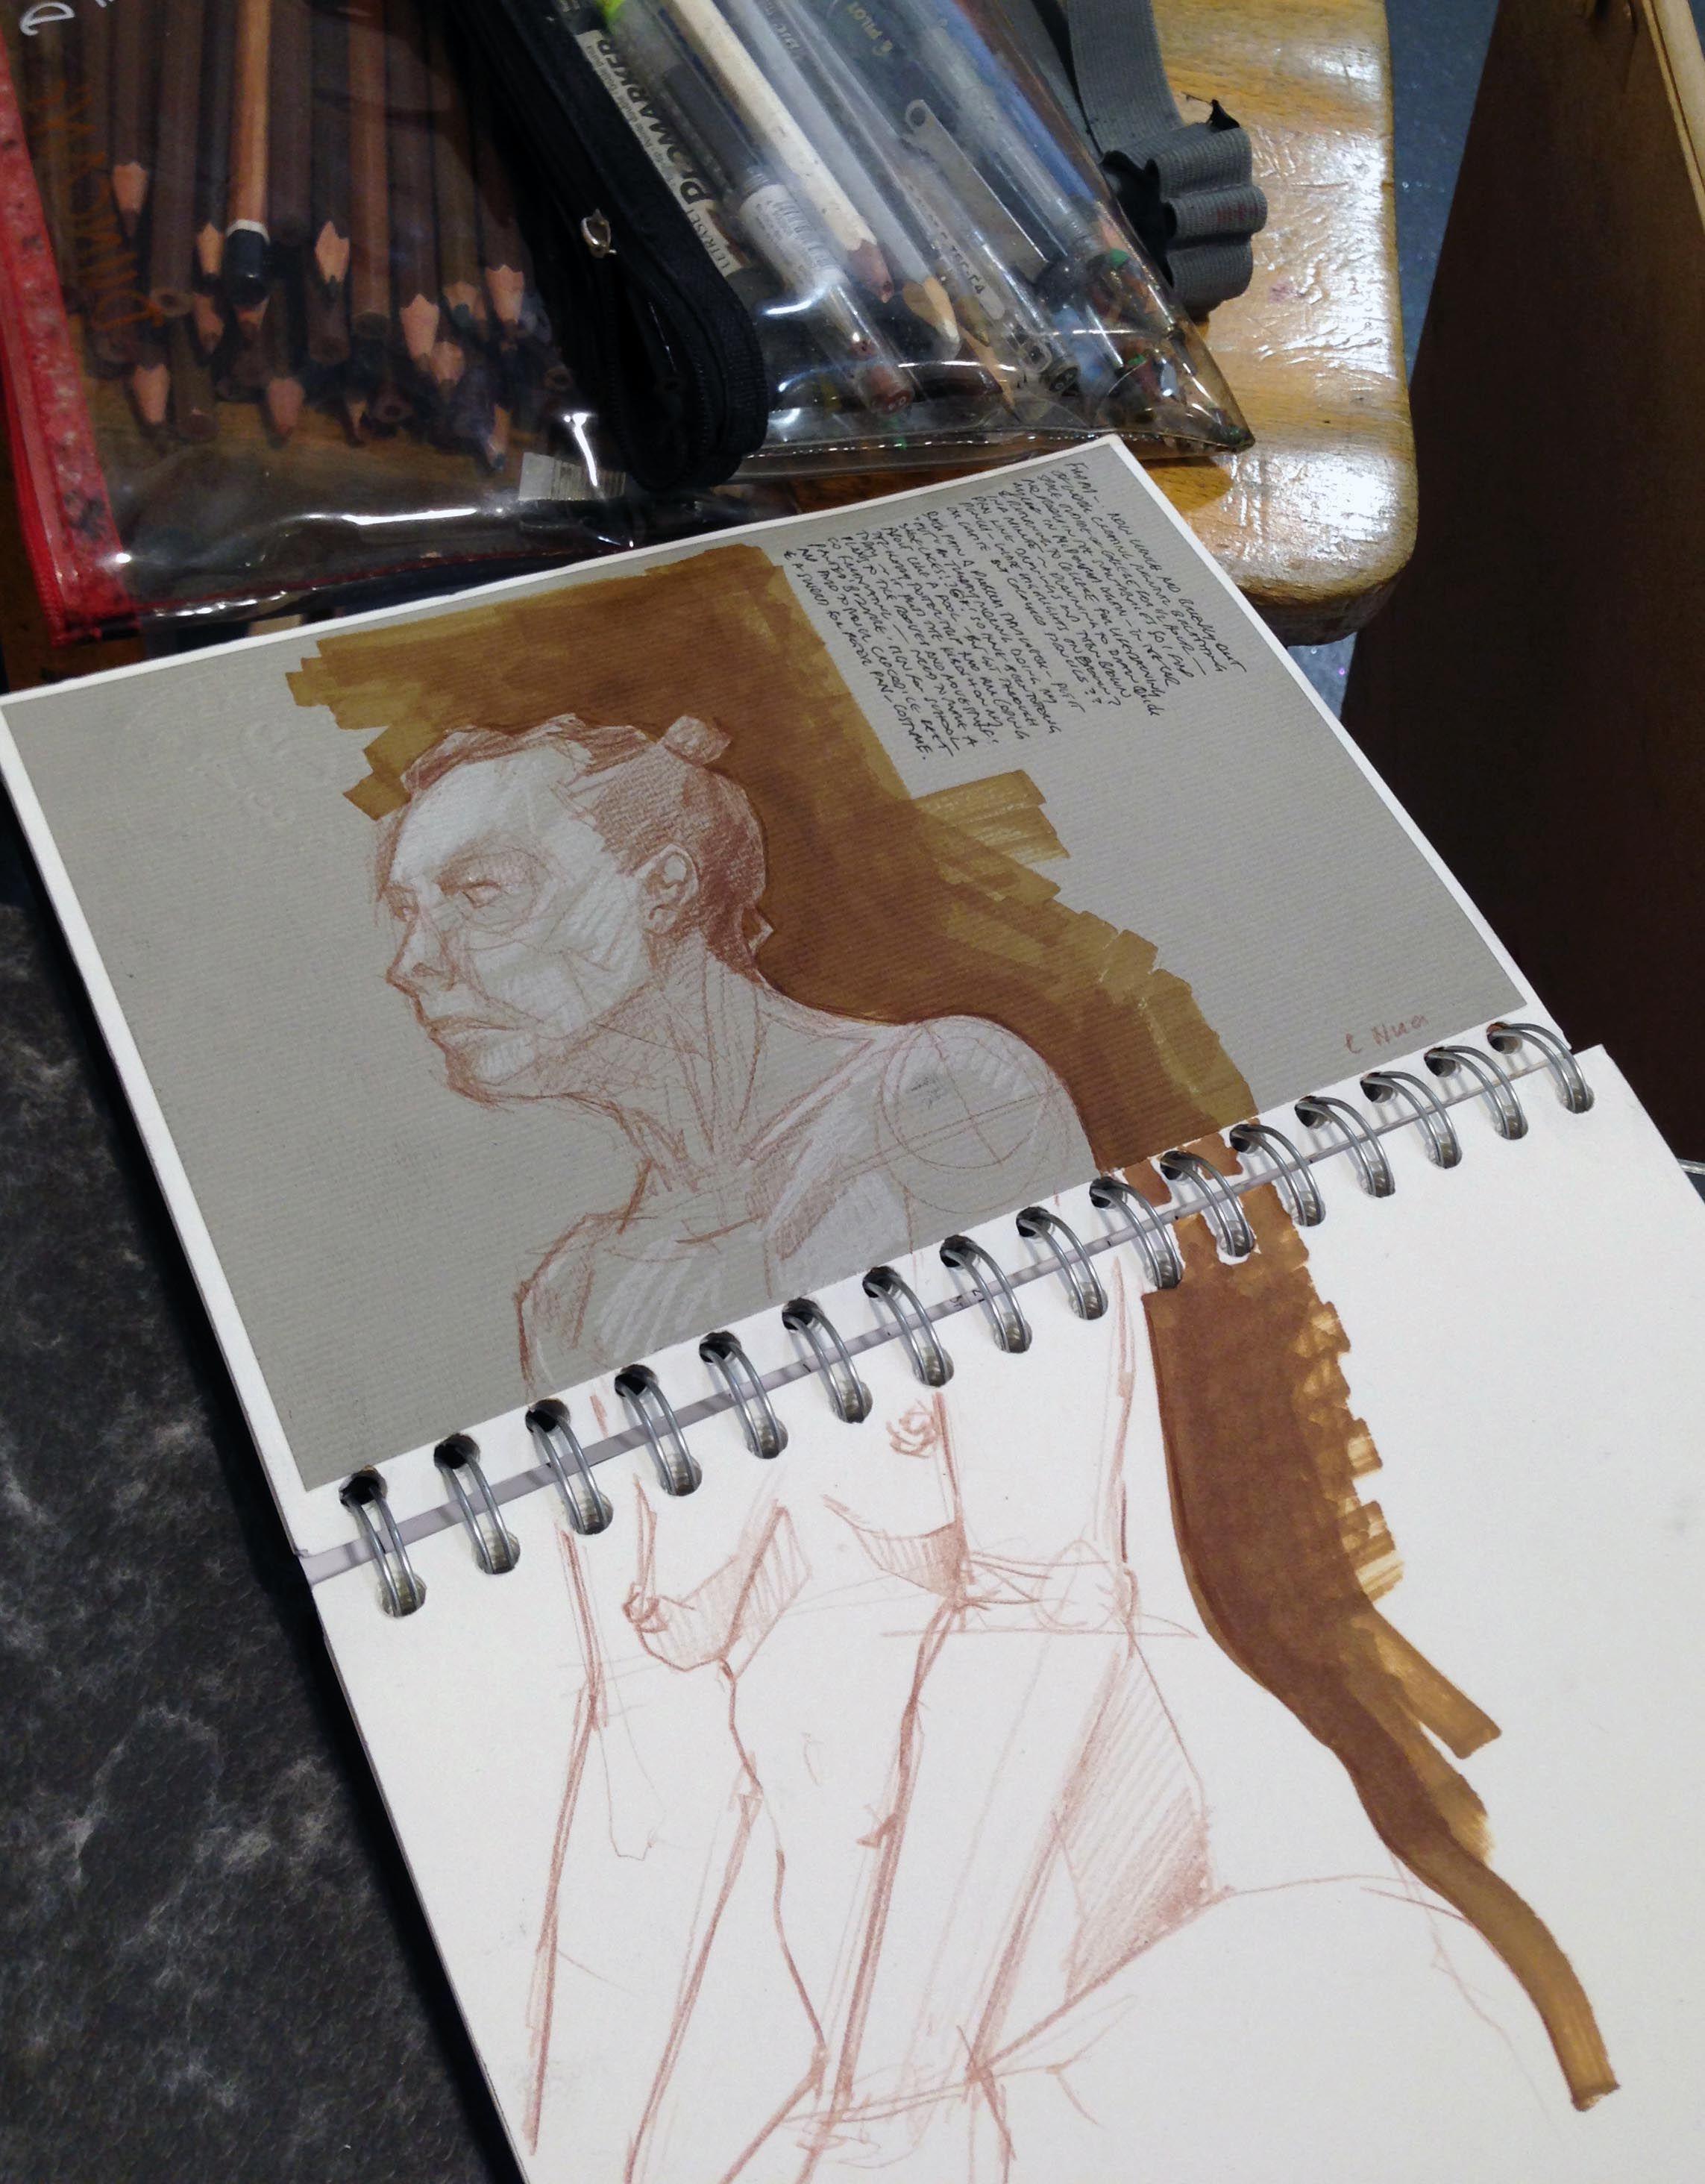 Artist Life Drawing Sketch Pad